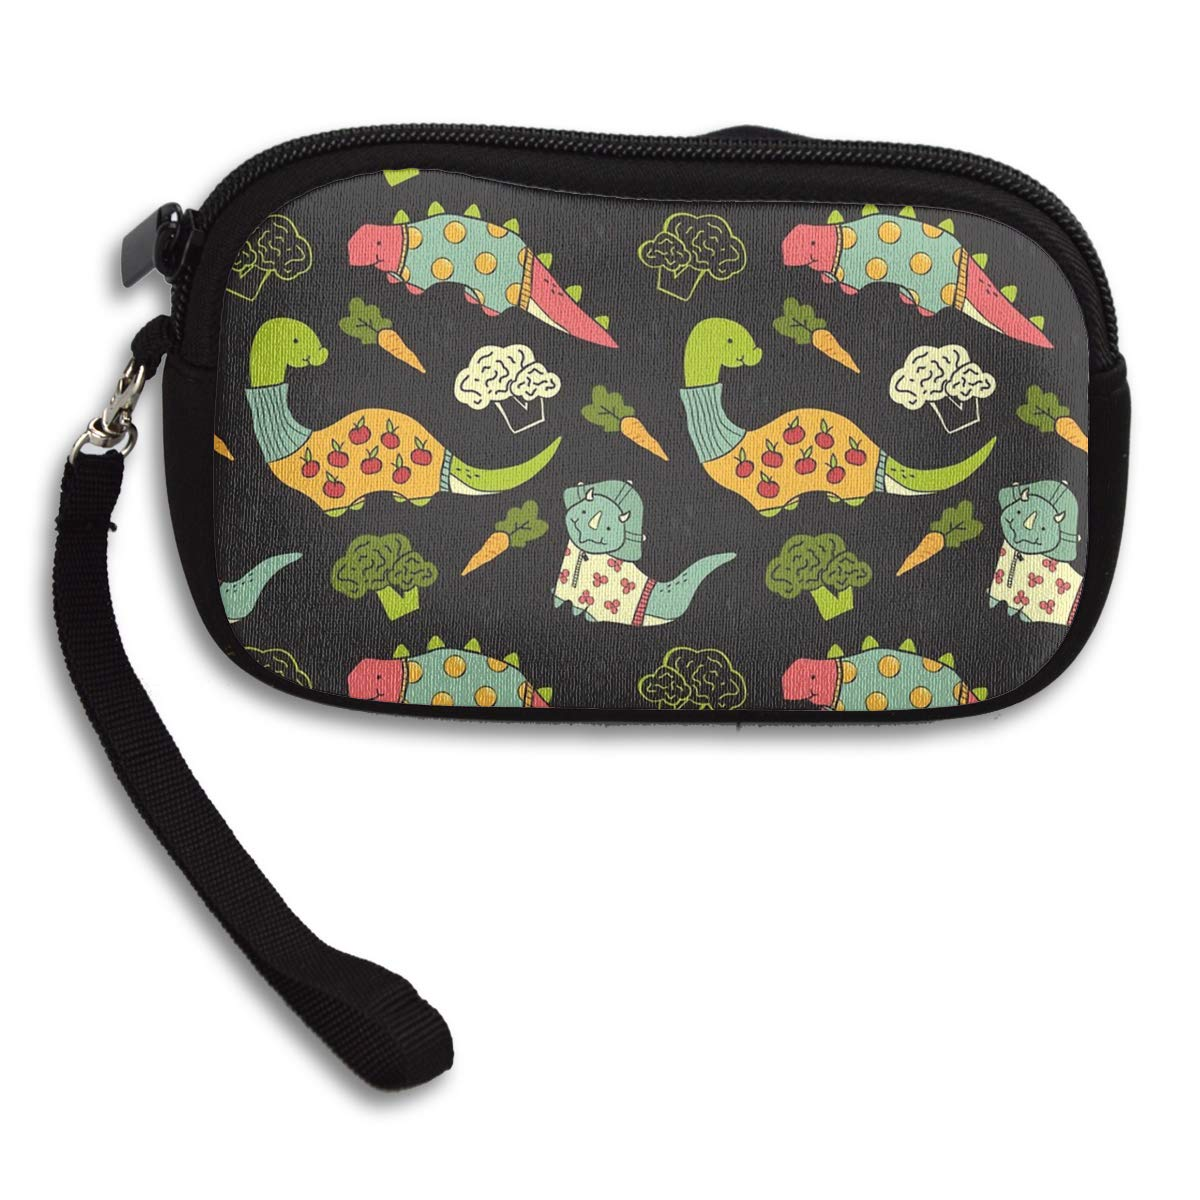 Eat Veggies Dinosaur Cherry Vegetables Coin Pouch Clutch Purse Wristlet Wallet Phone Card Holder Handbag